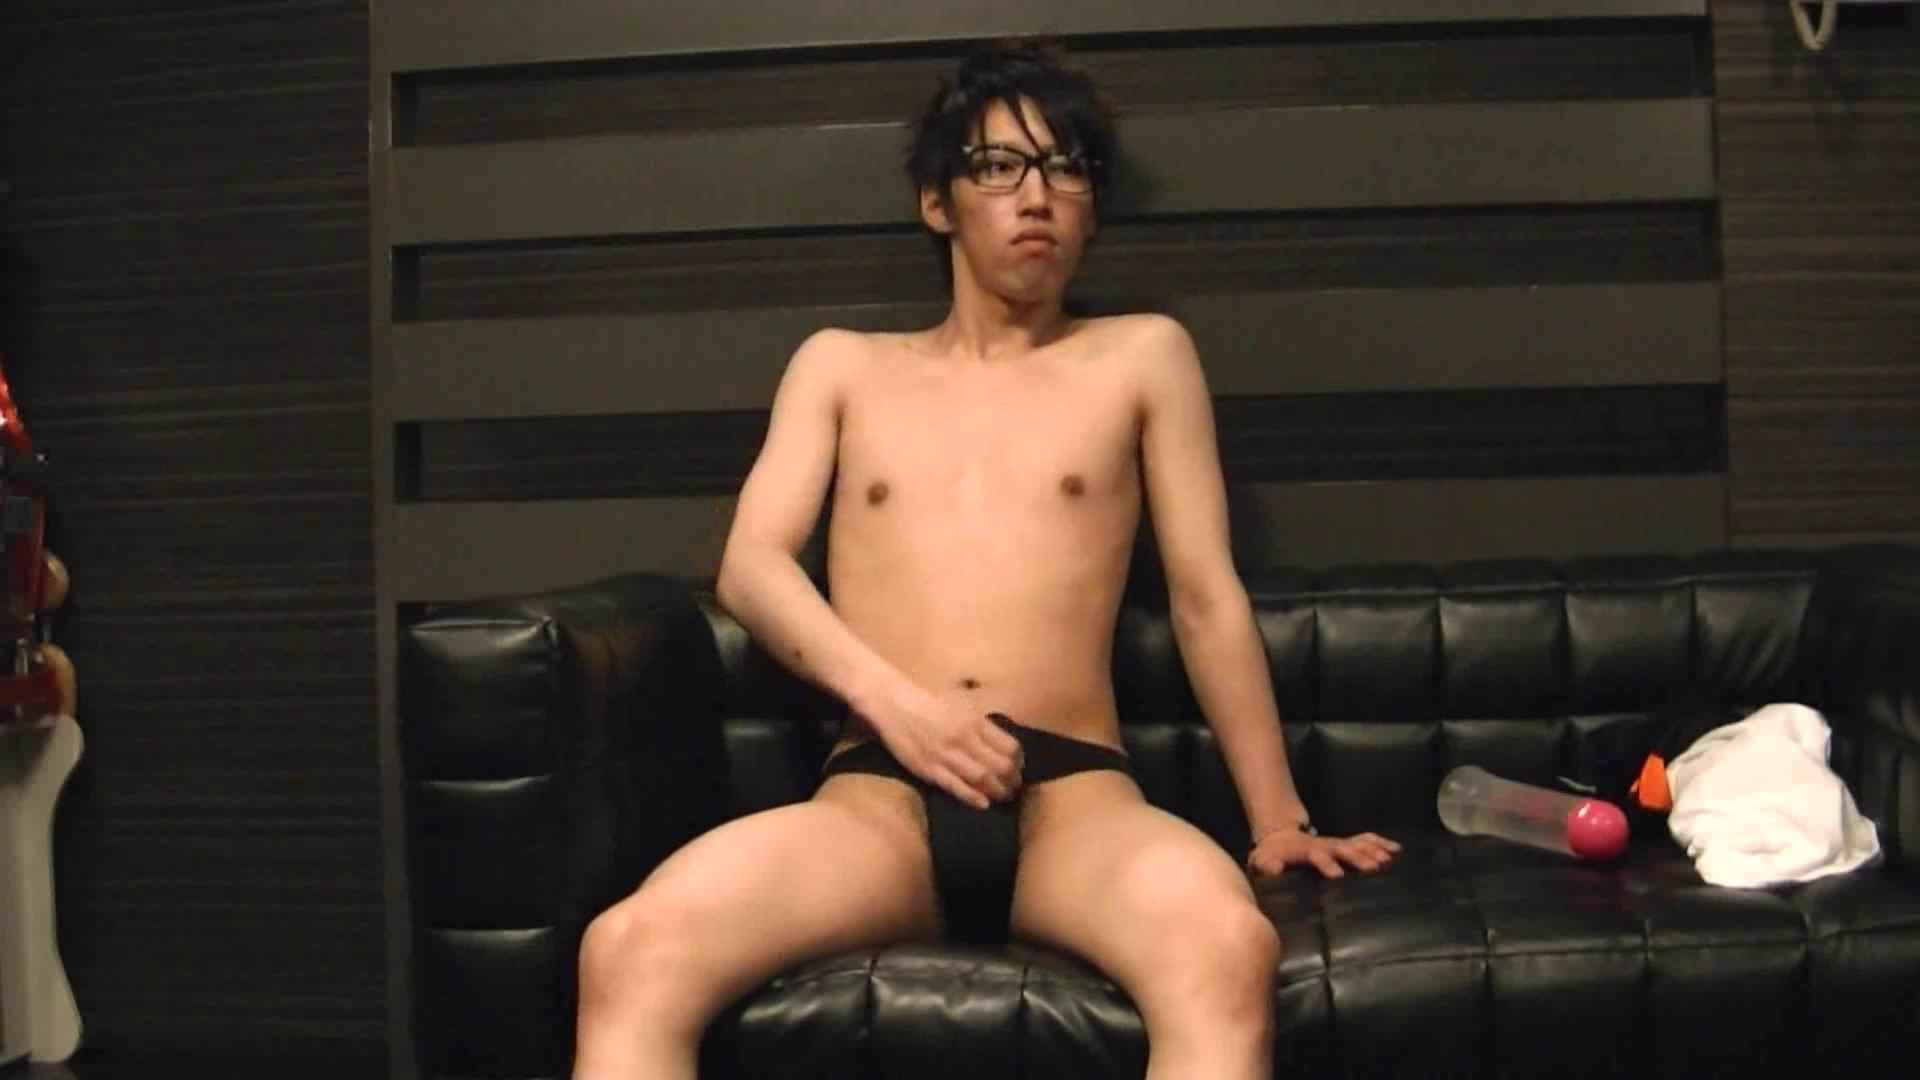 ONA見せカーニバル!! Vol3 男  93pic 31